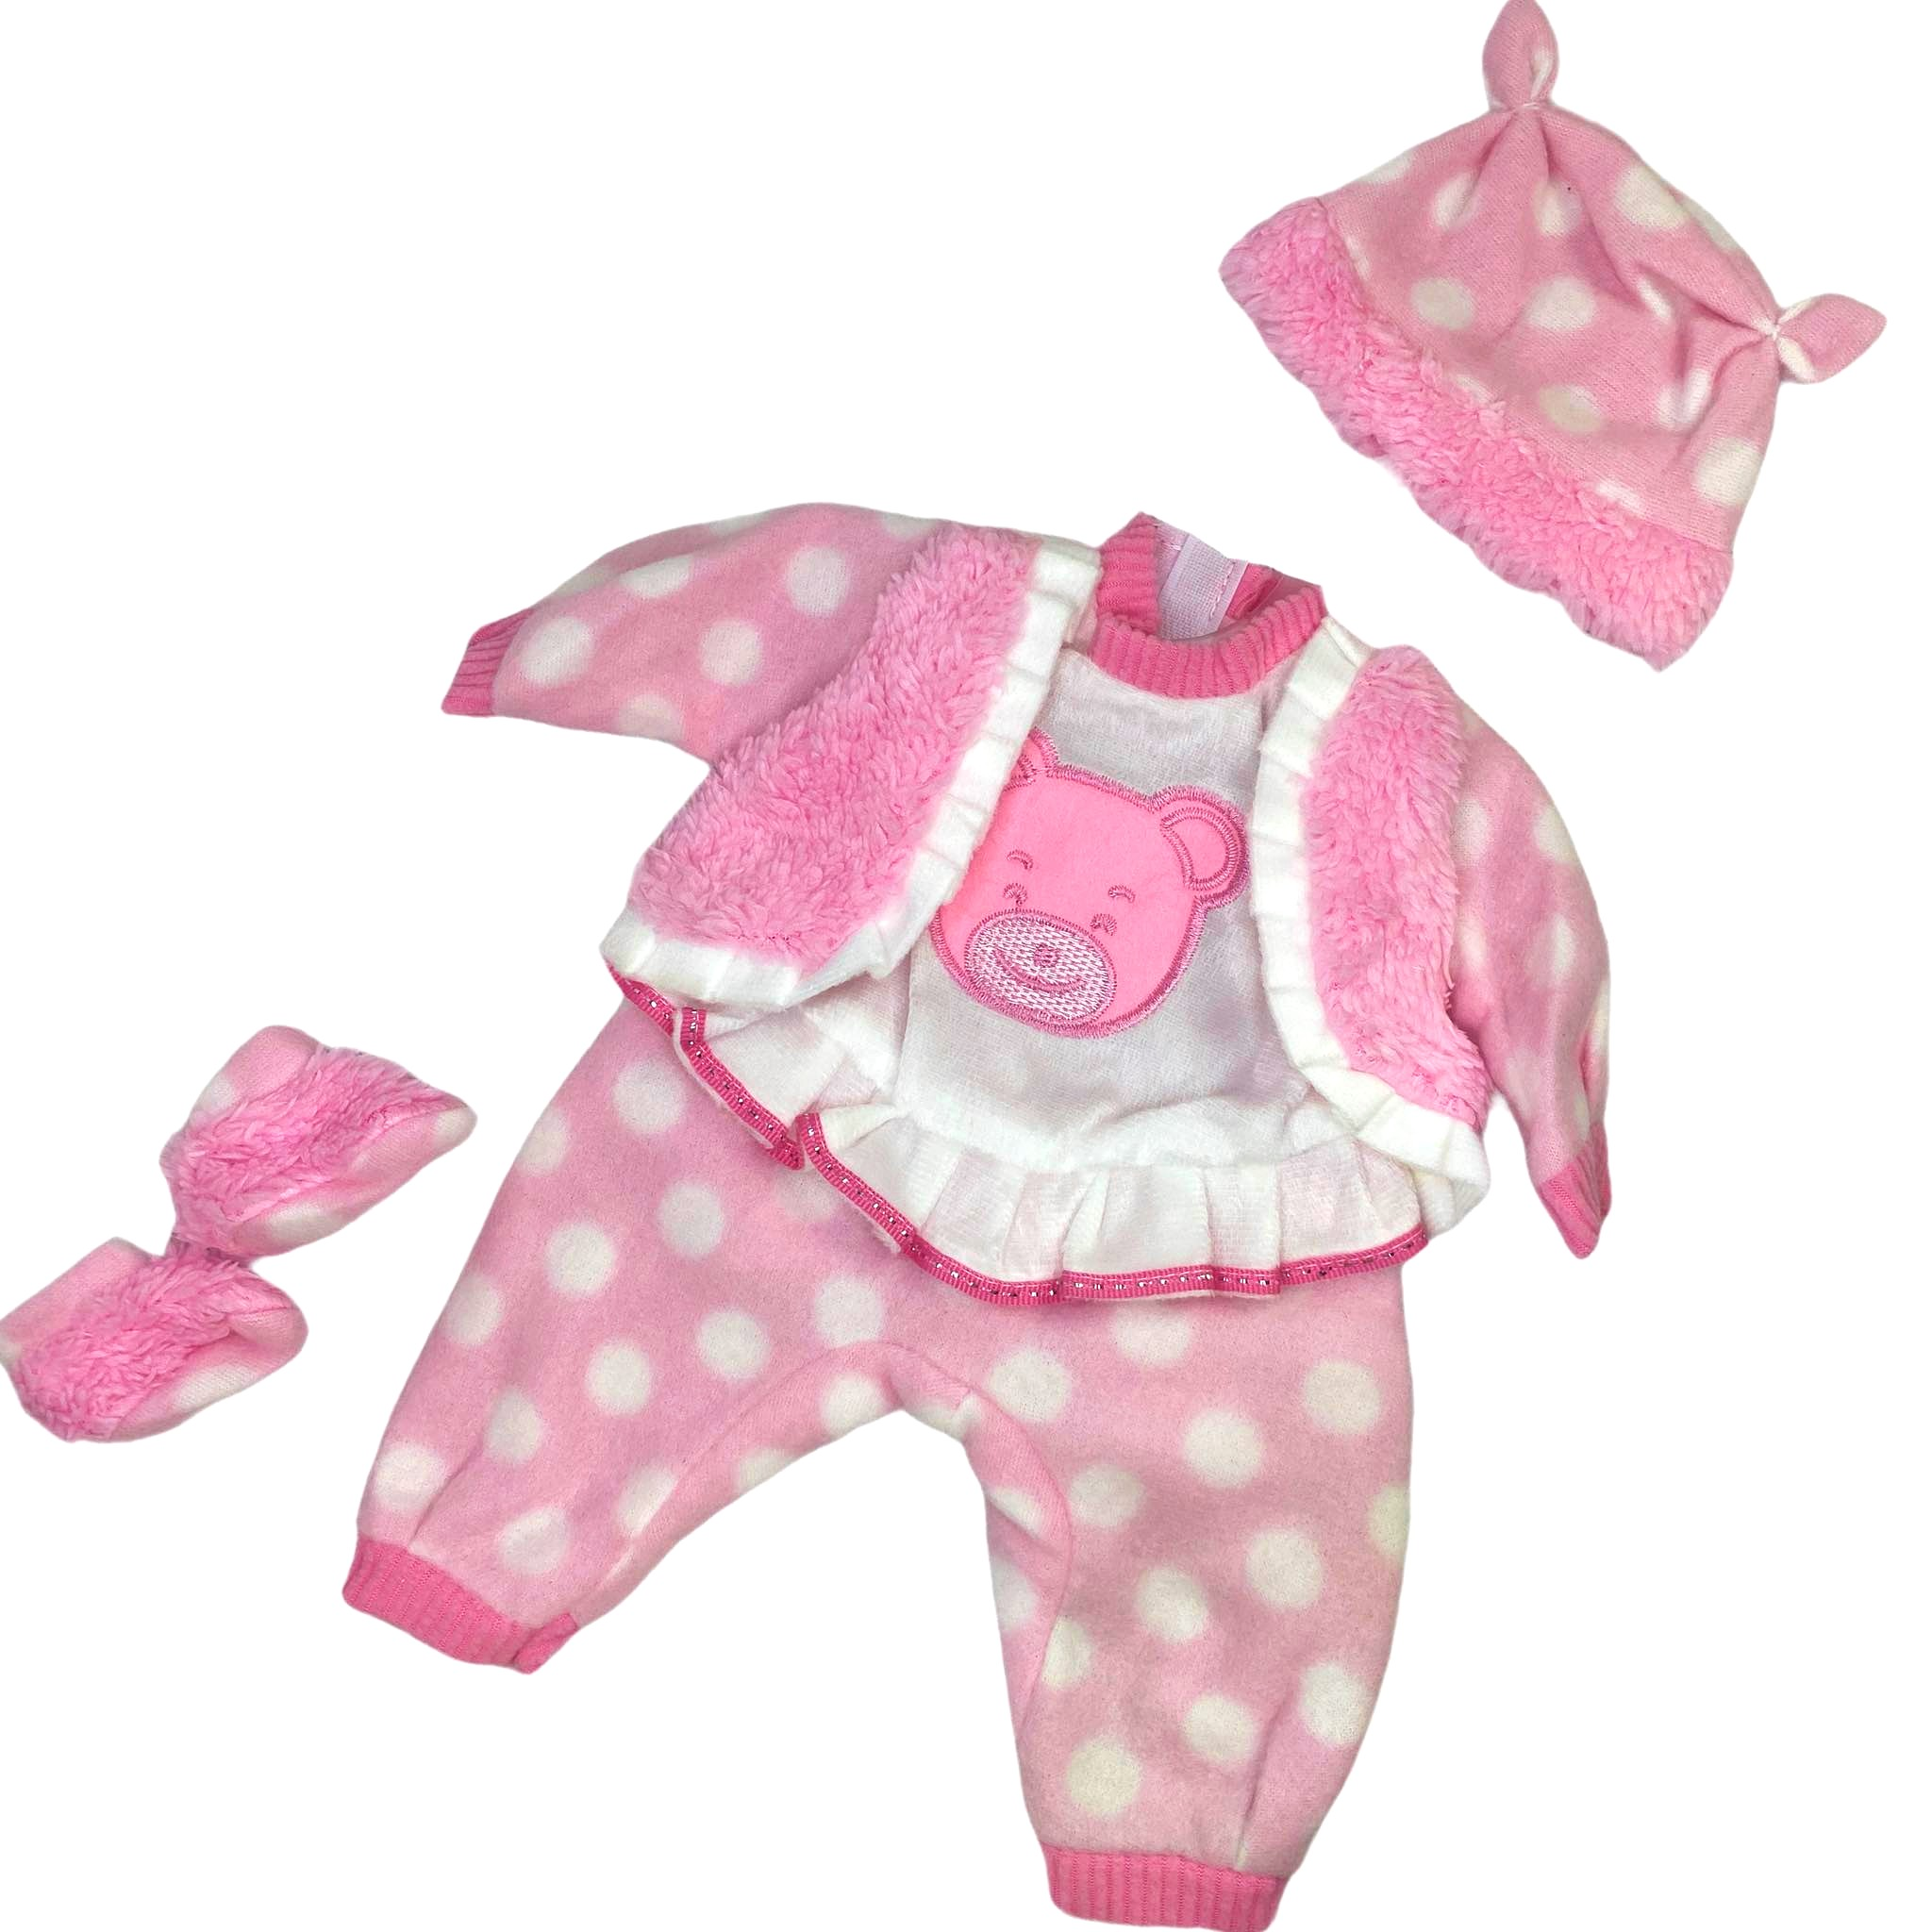 Ubranko dla bobasa lalki 40 cm